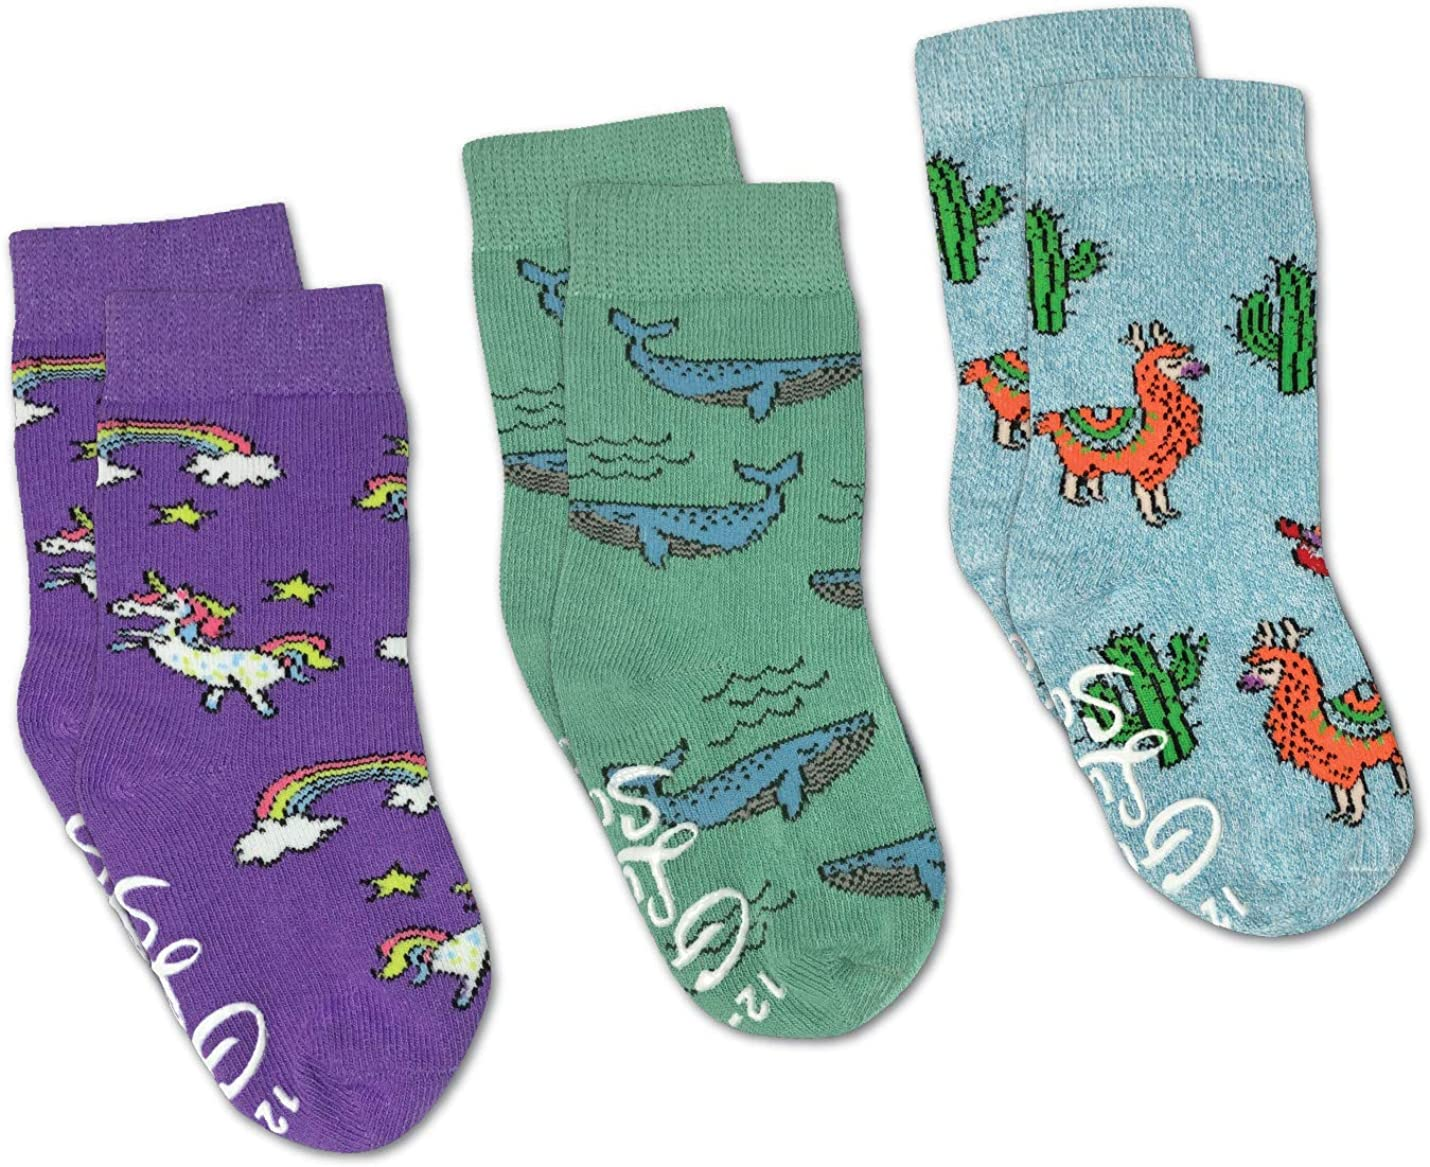 Llamas, Unicorns and Whales Kids Toddler Socks, 3-Pack